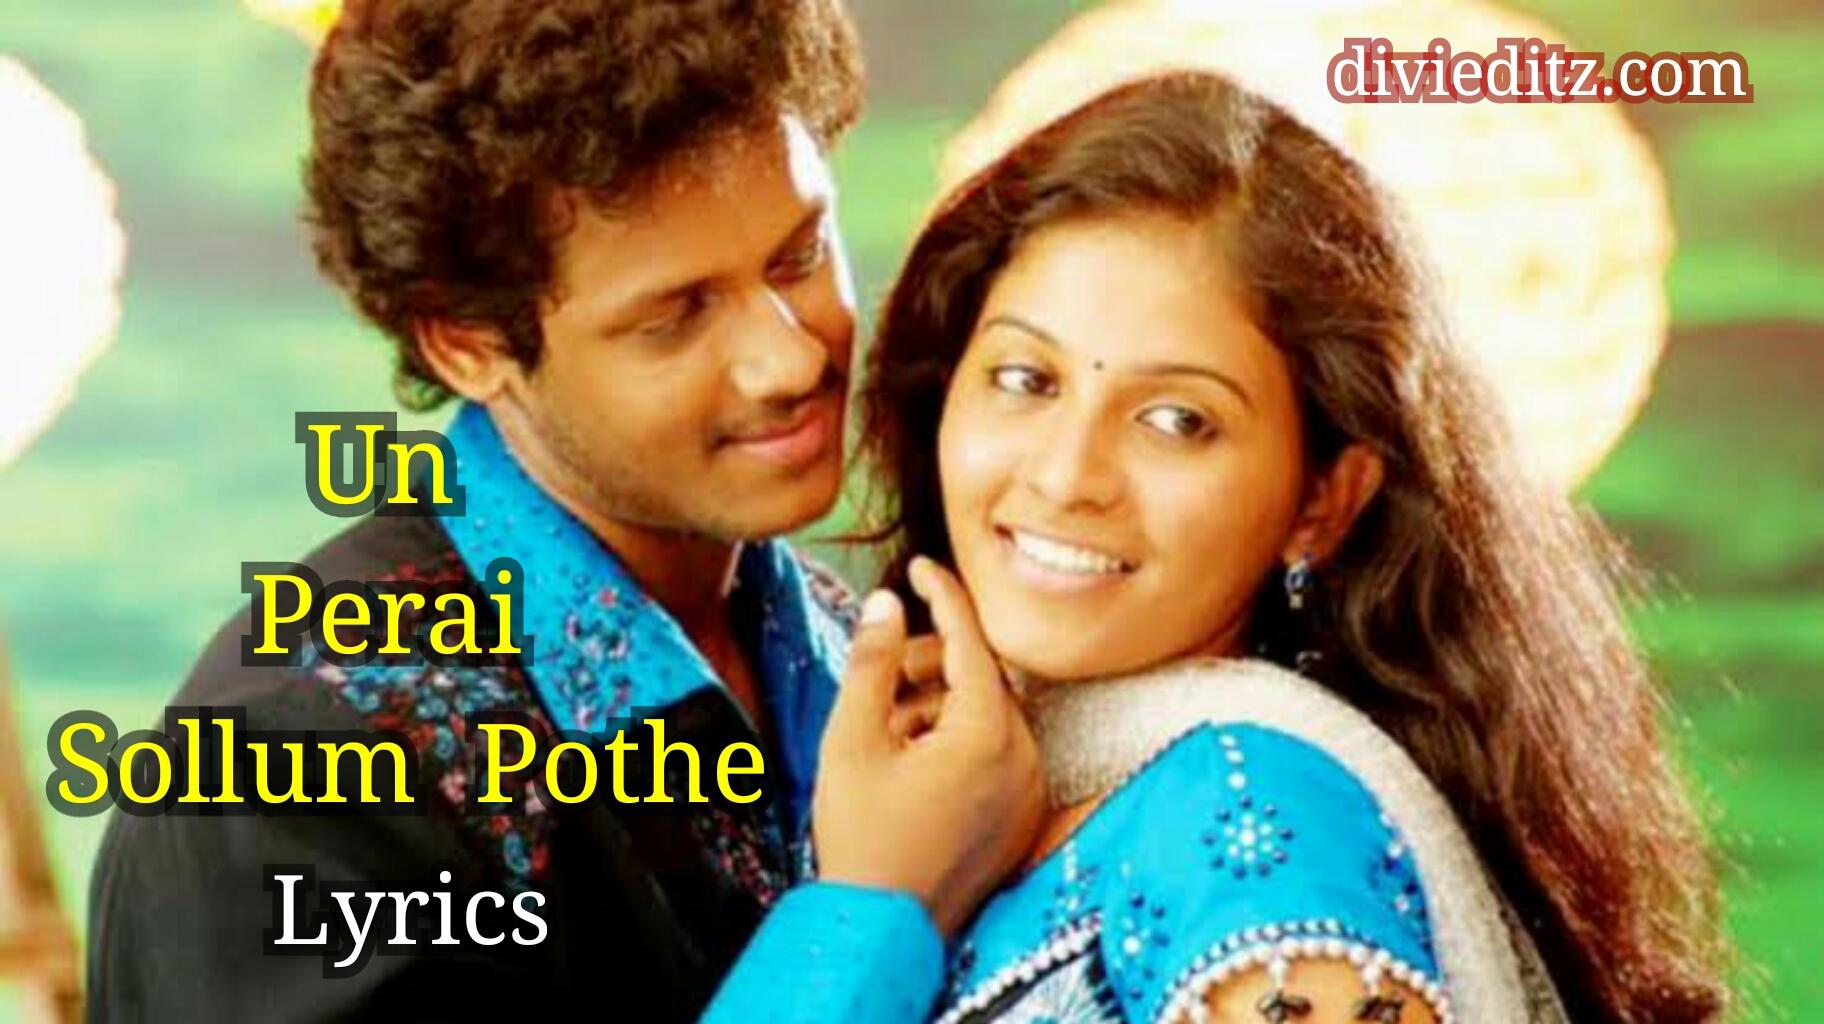 Un Perai Sollum Pothe song lyrics – Angadi Theru movie